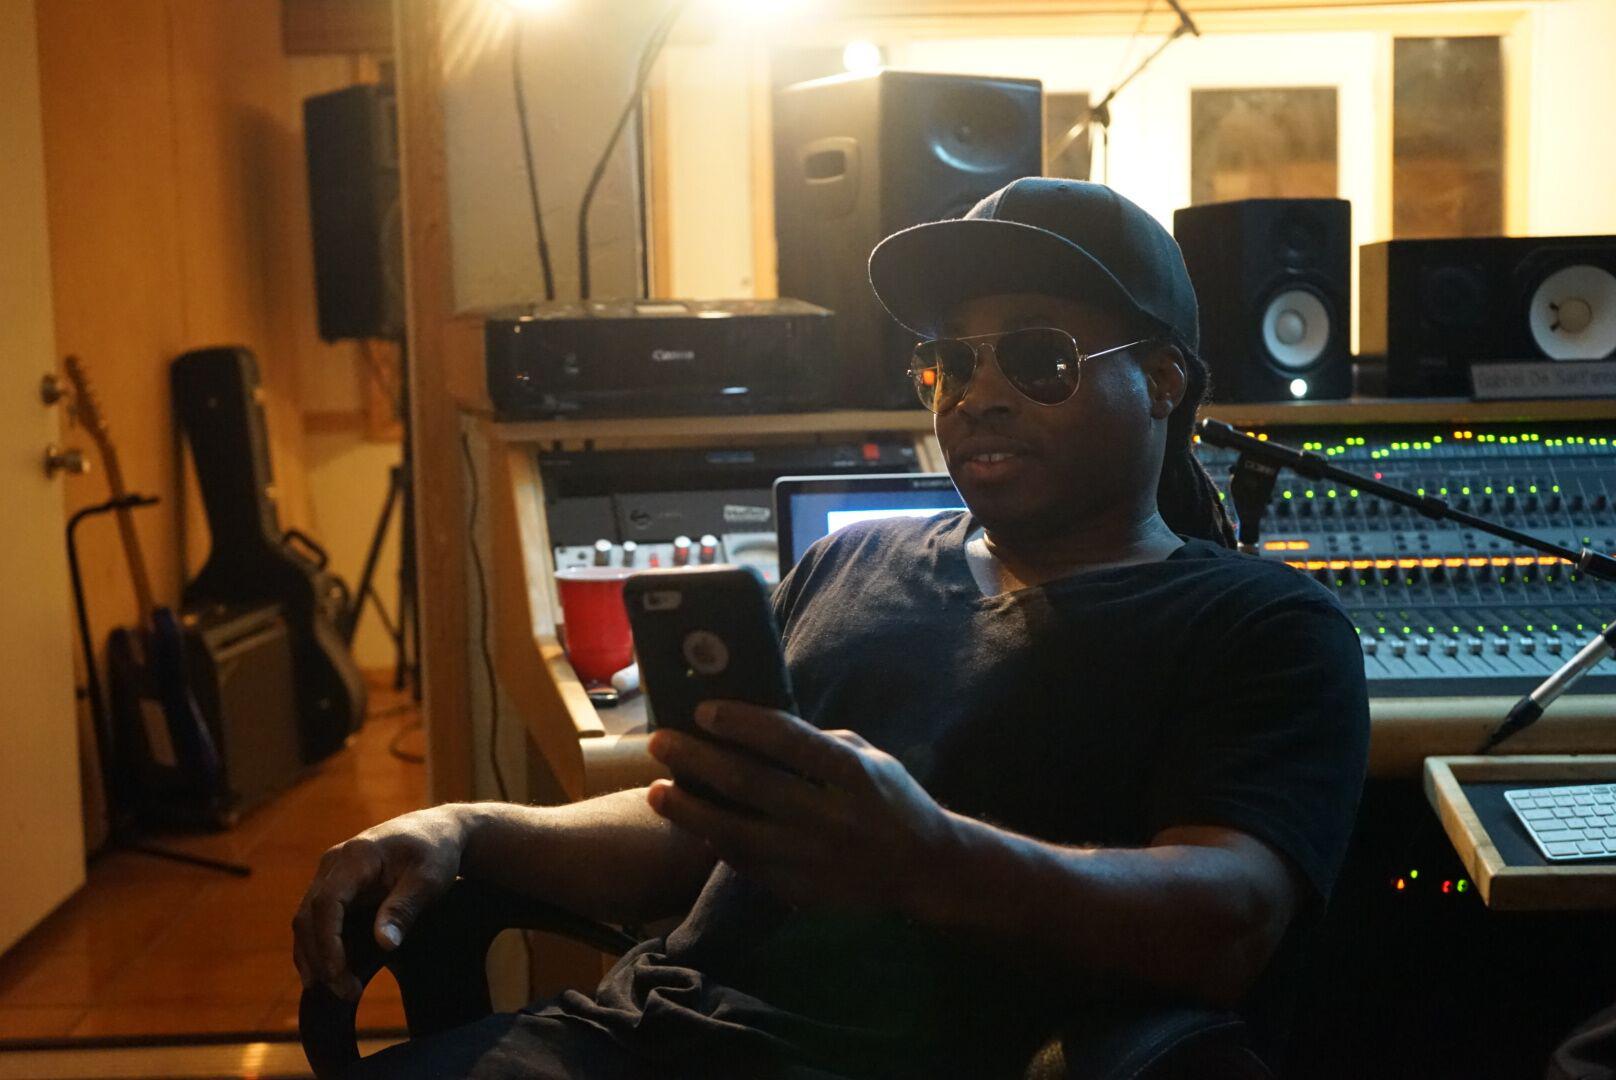 GoldMine The Rapper in   a recording session with the amazing engineer Gabriel De Sant'anna at Recon Recording Studios in Tarzana, CA.